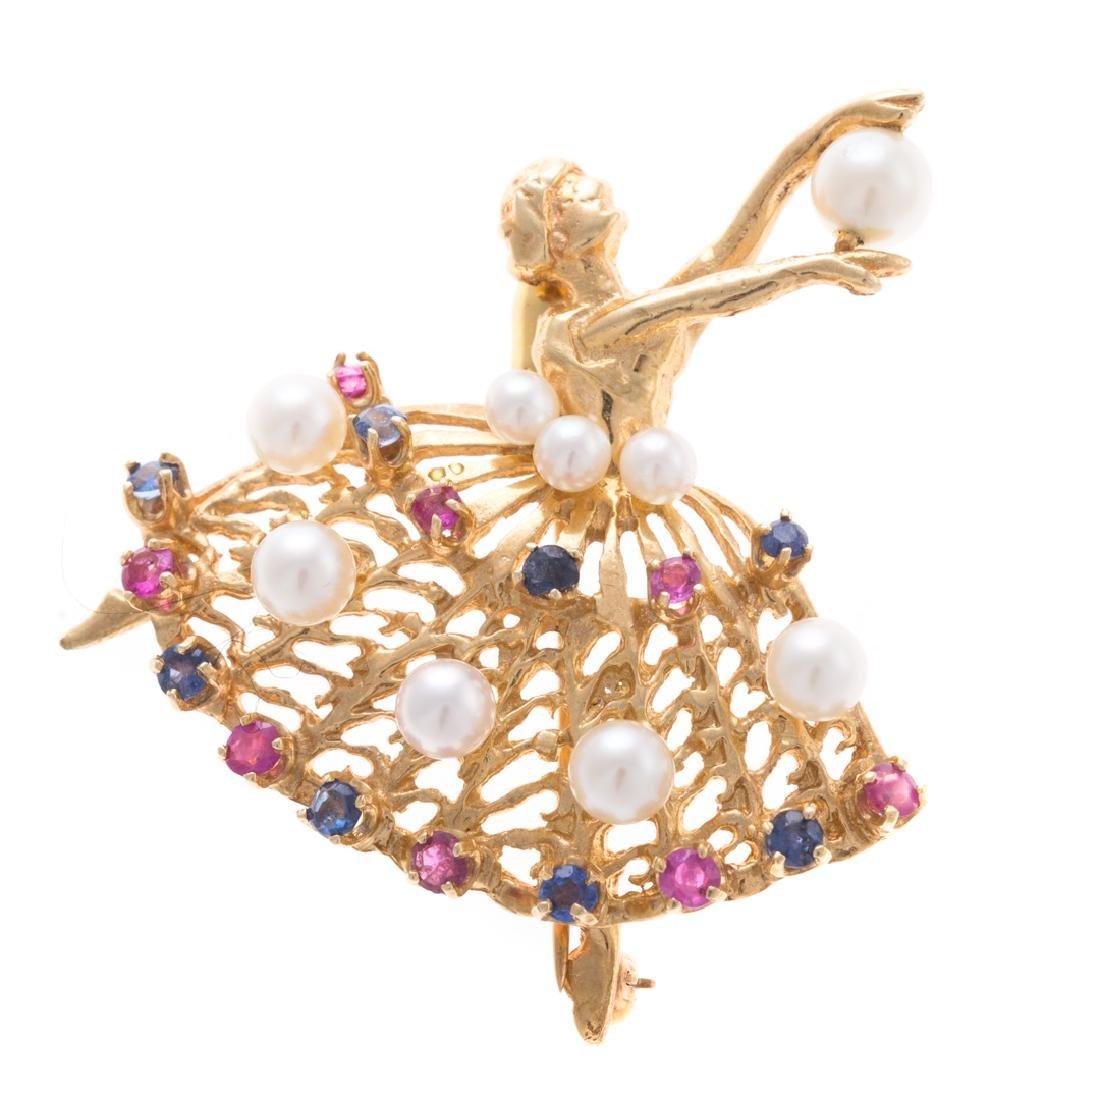 A Lady's 14K Pearl & Gemstone Ballerina Pin